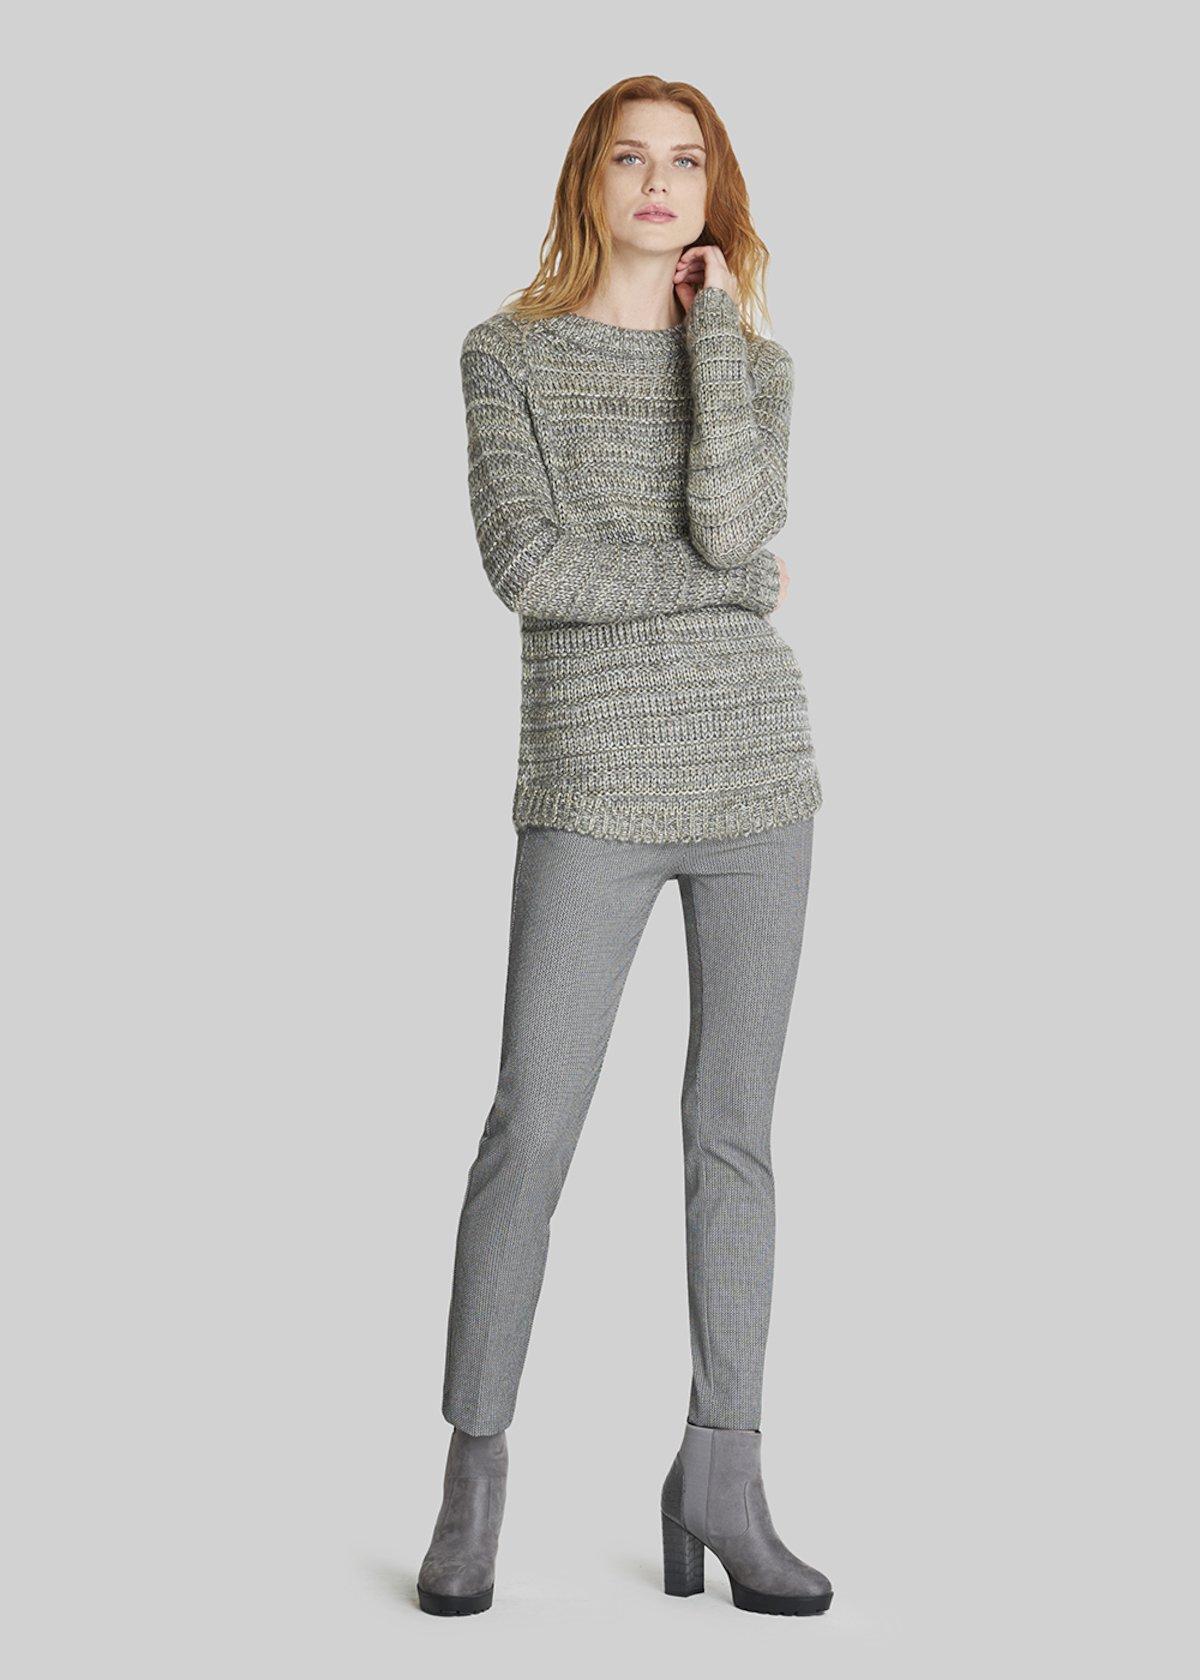 Mabell multicolour sweater - Medium Grey Melange / Lurex - Woman - Category image